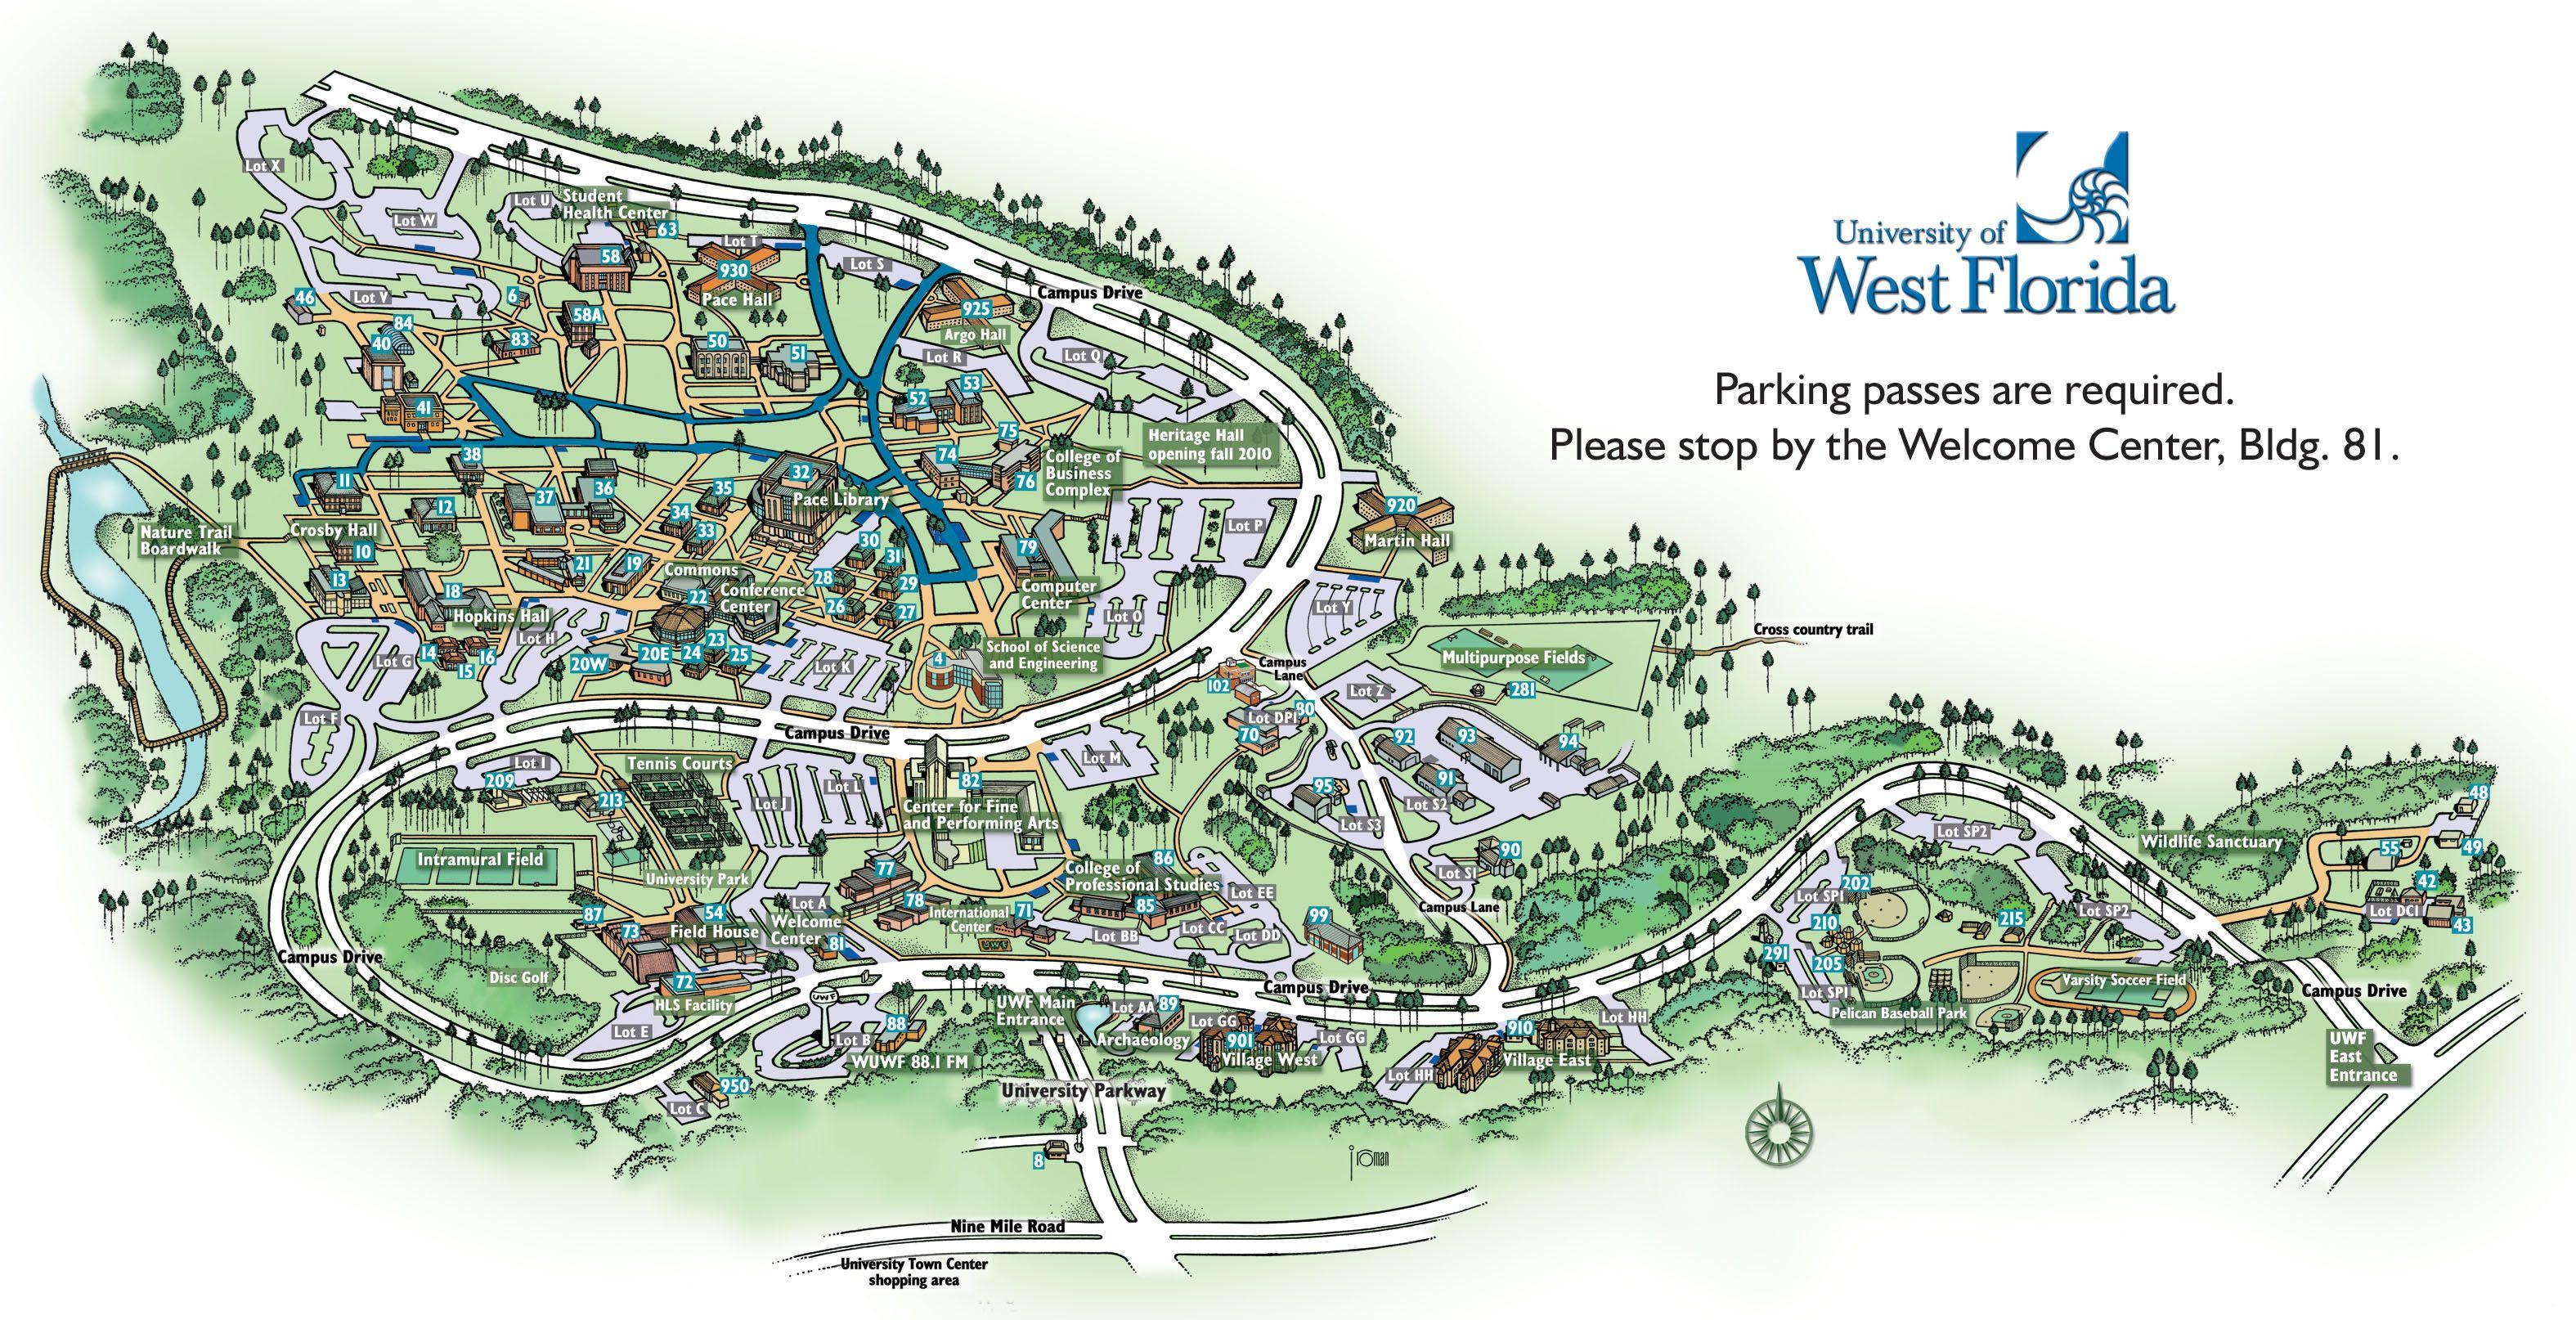 University Of West Florida Map University of West Floridaso many great memories